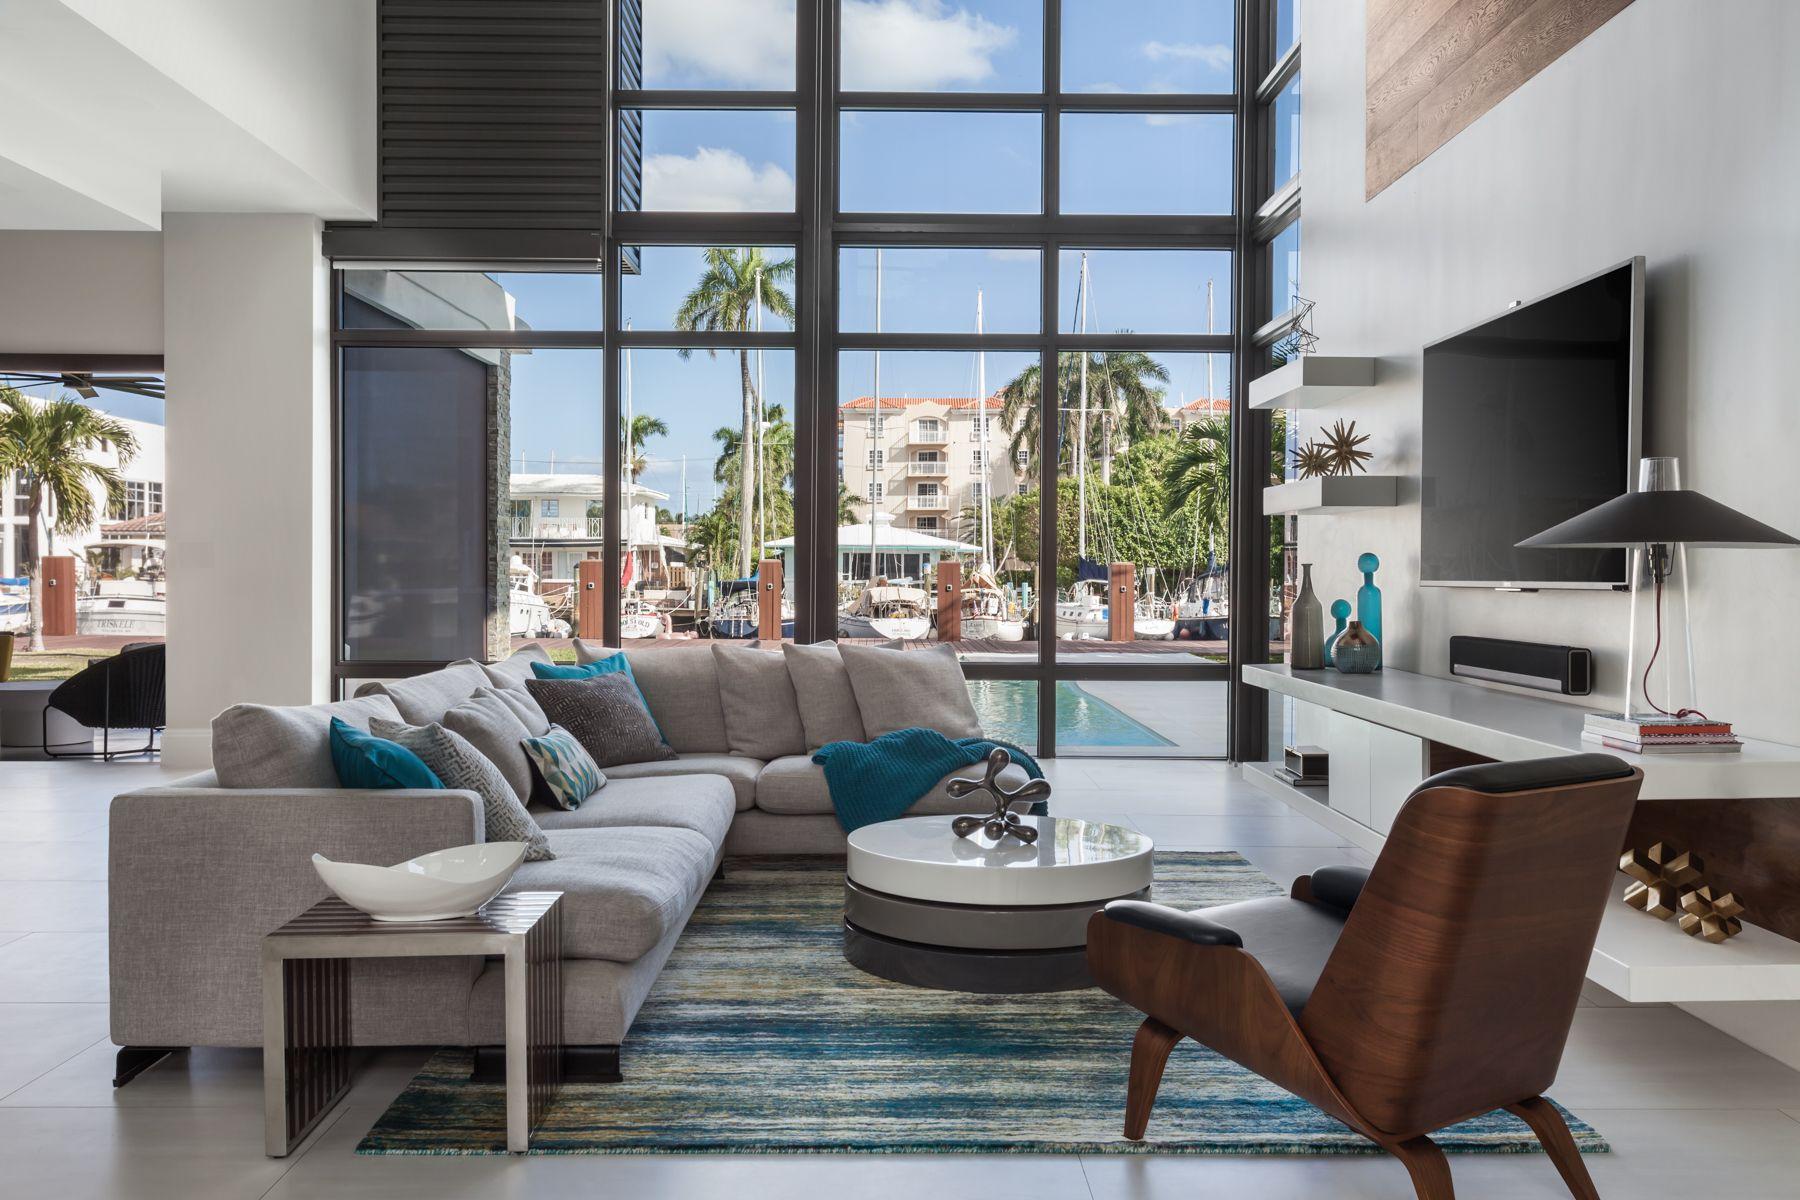 Modern Fort Lauderdale Living Room on the